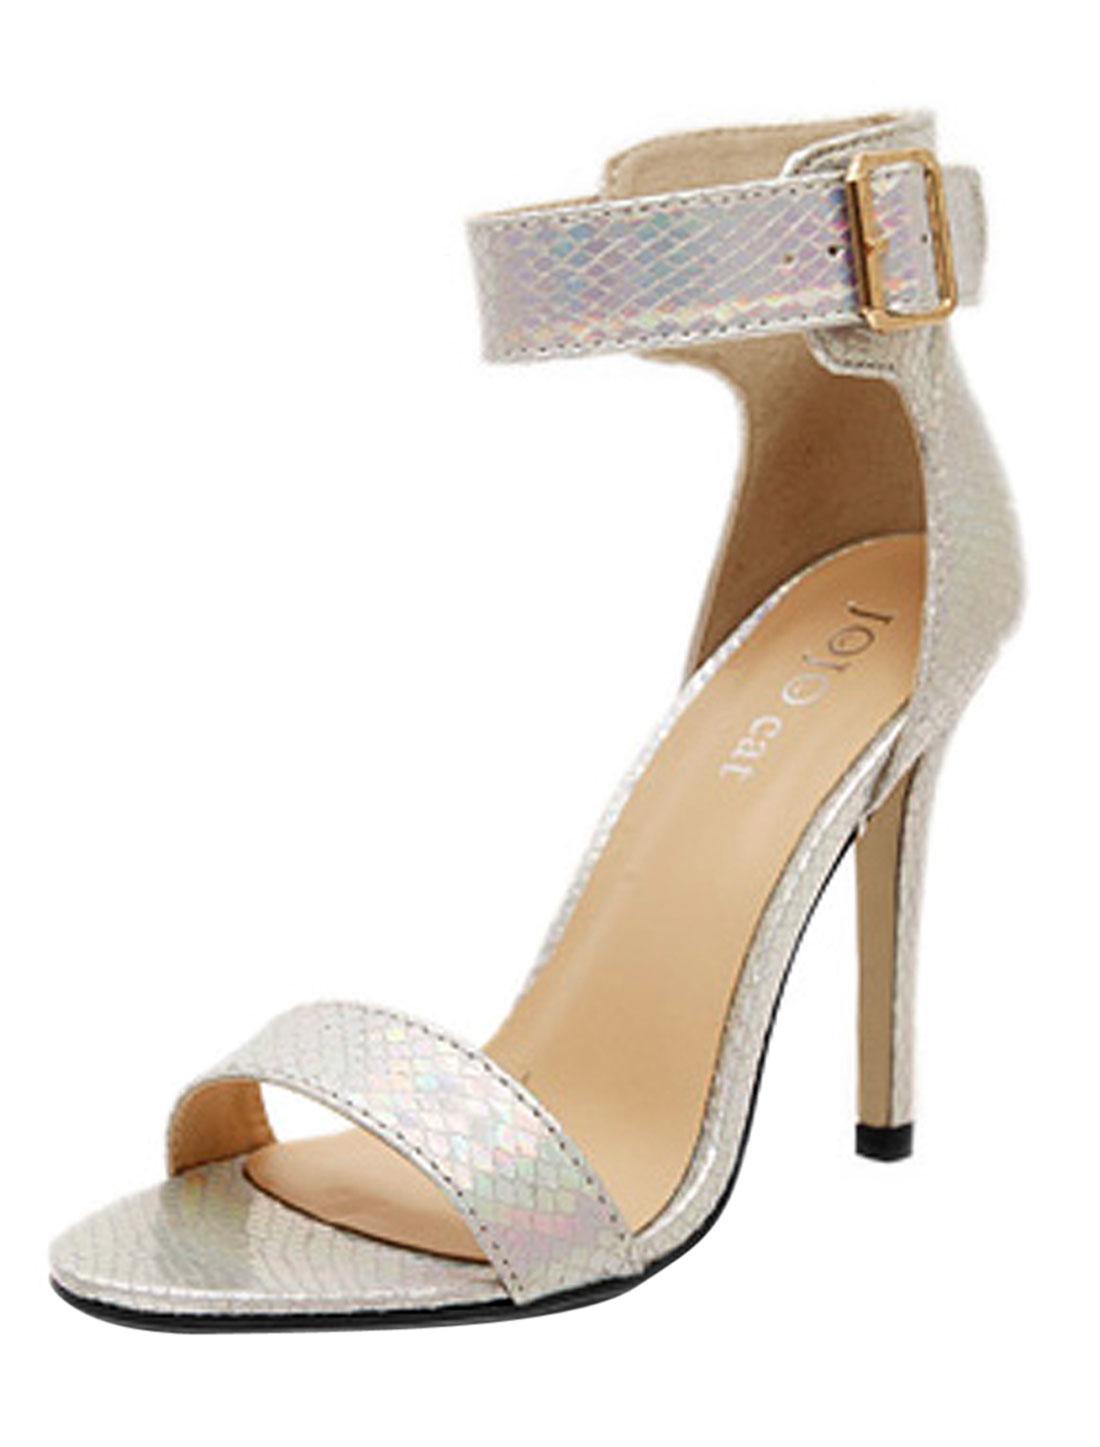 Women Metallic Snakeskin Design Textured Sandals Silver Tone US 7.5